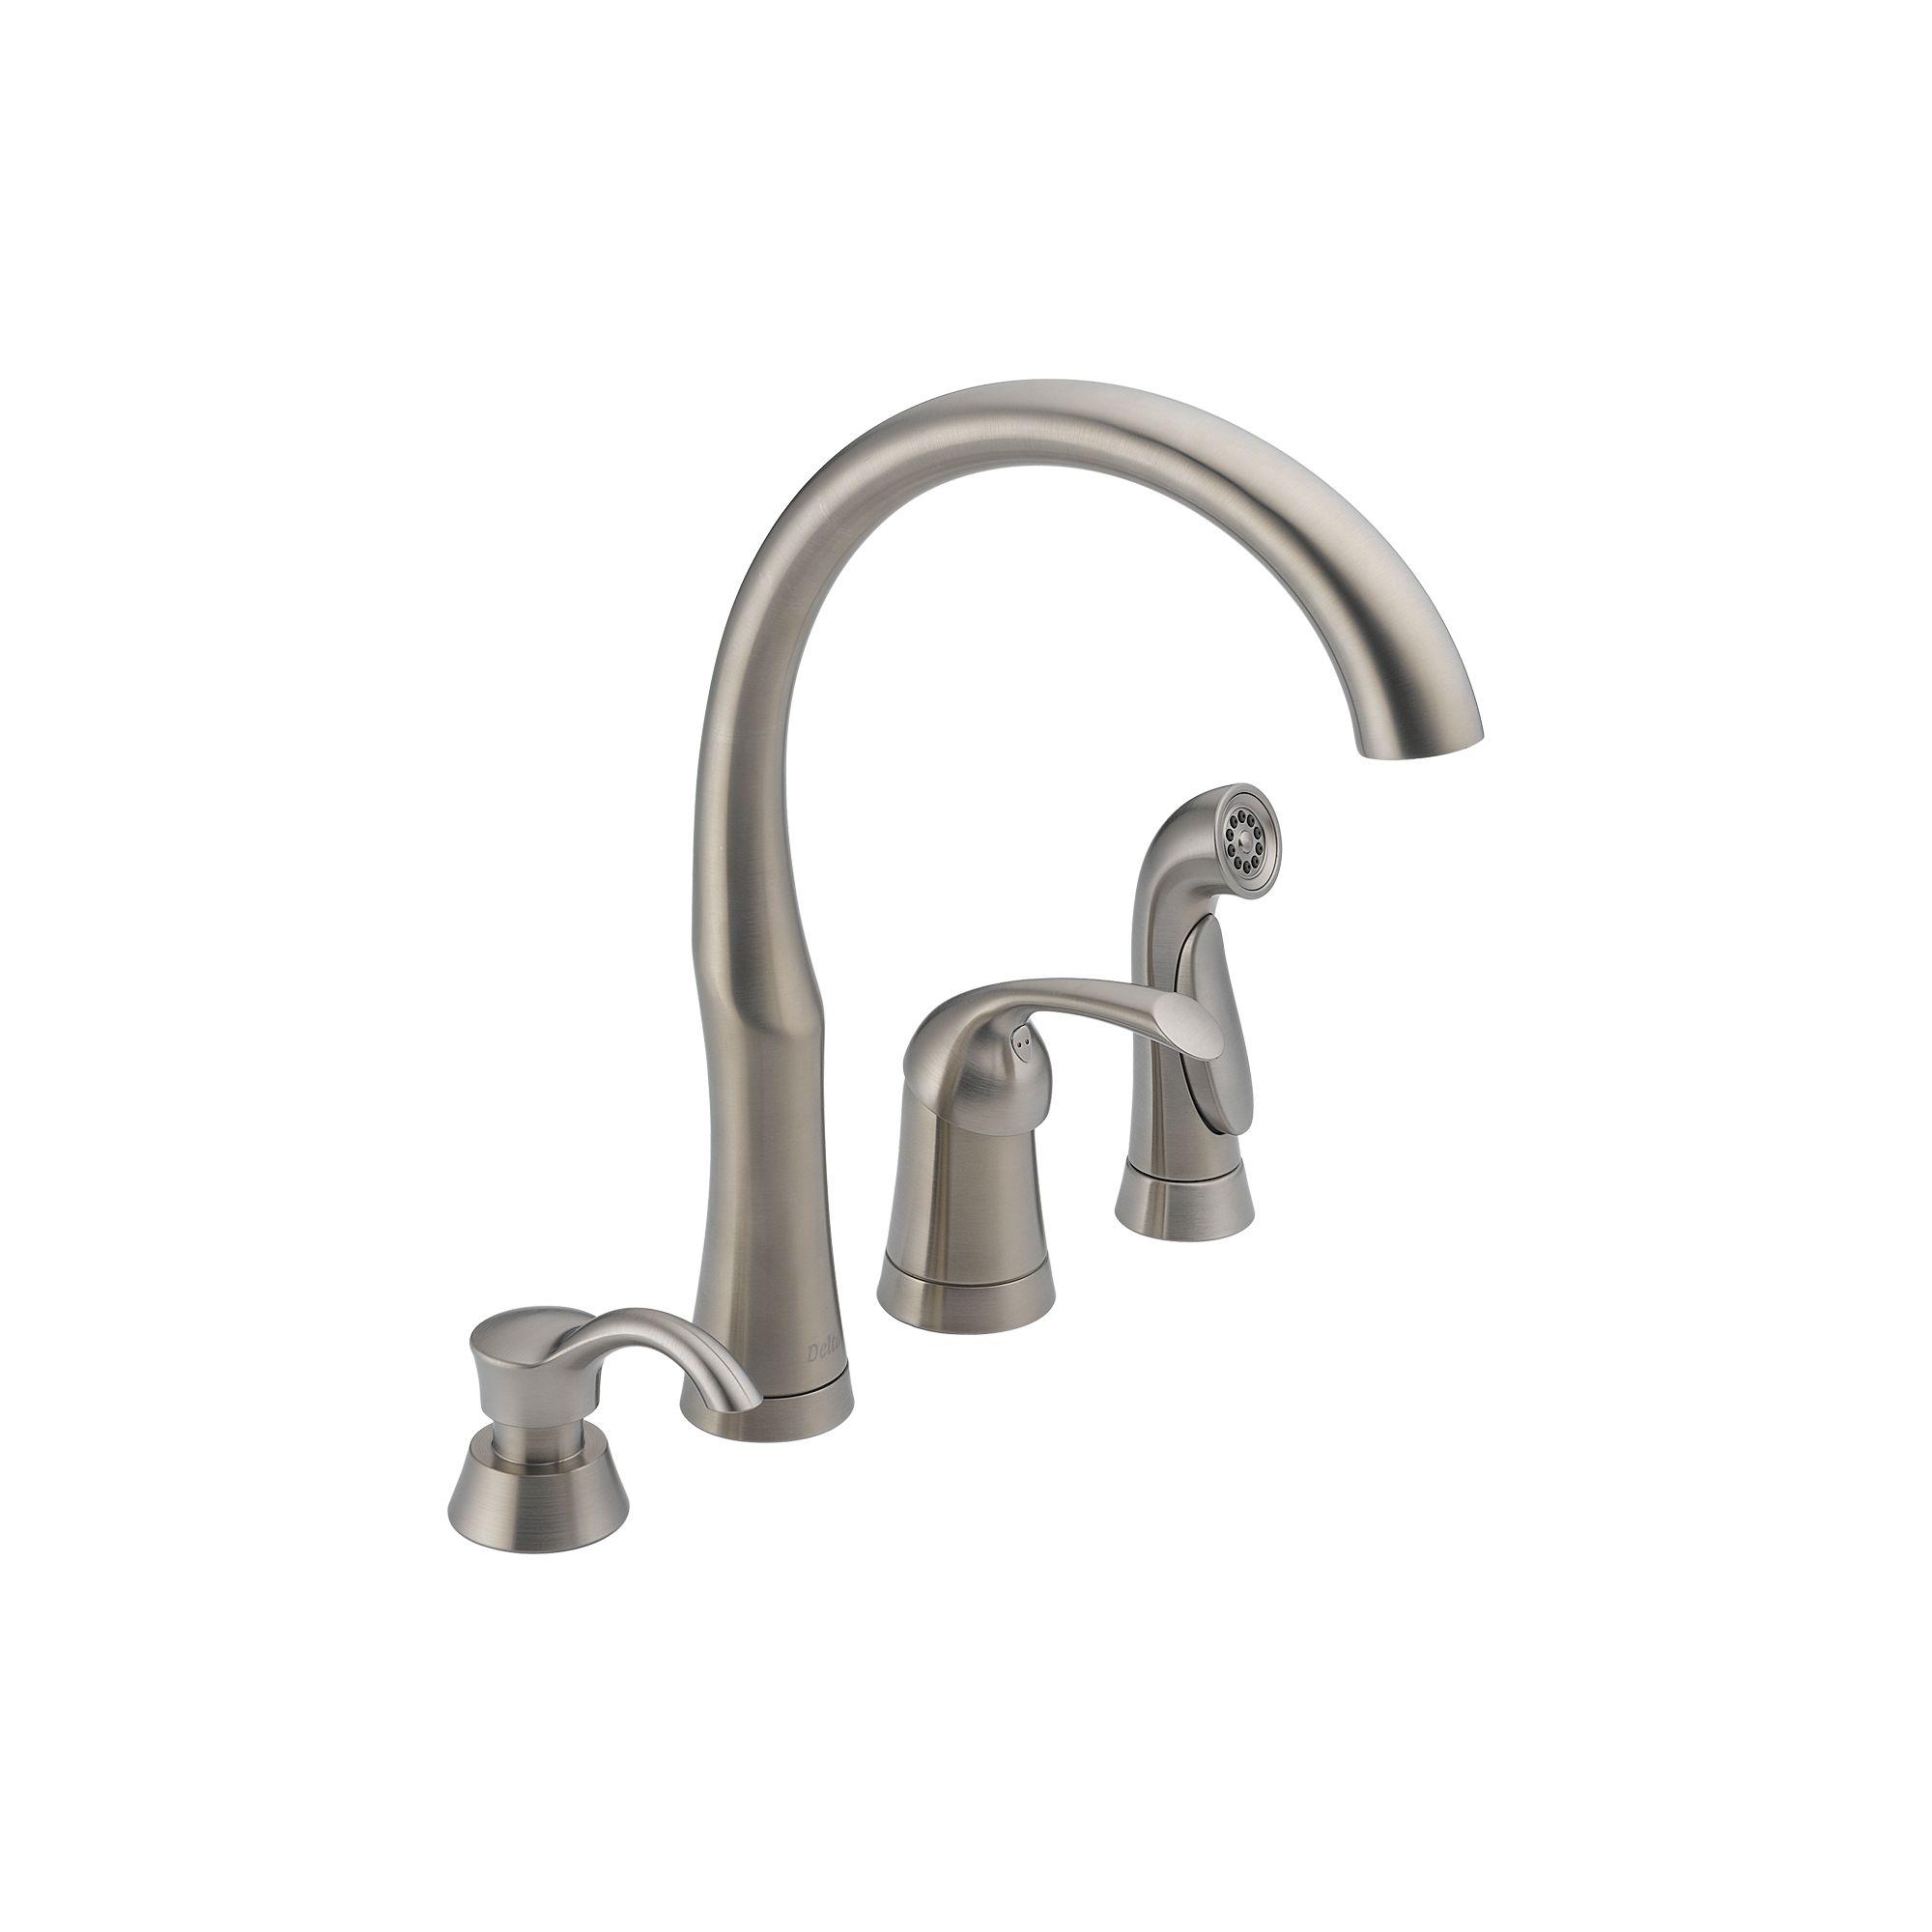 Ideas, delta talbott shower faucet delta talbott shower faucet delta talbott single handle pull down gallery with kitchen faucet 2000 x 2000  .